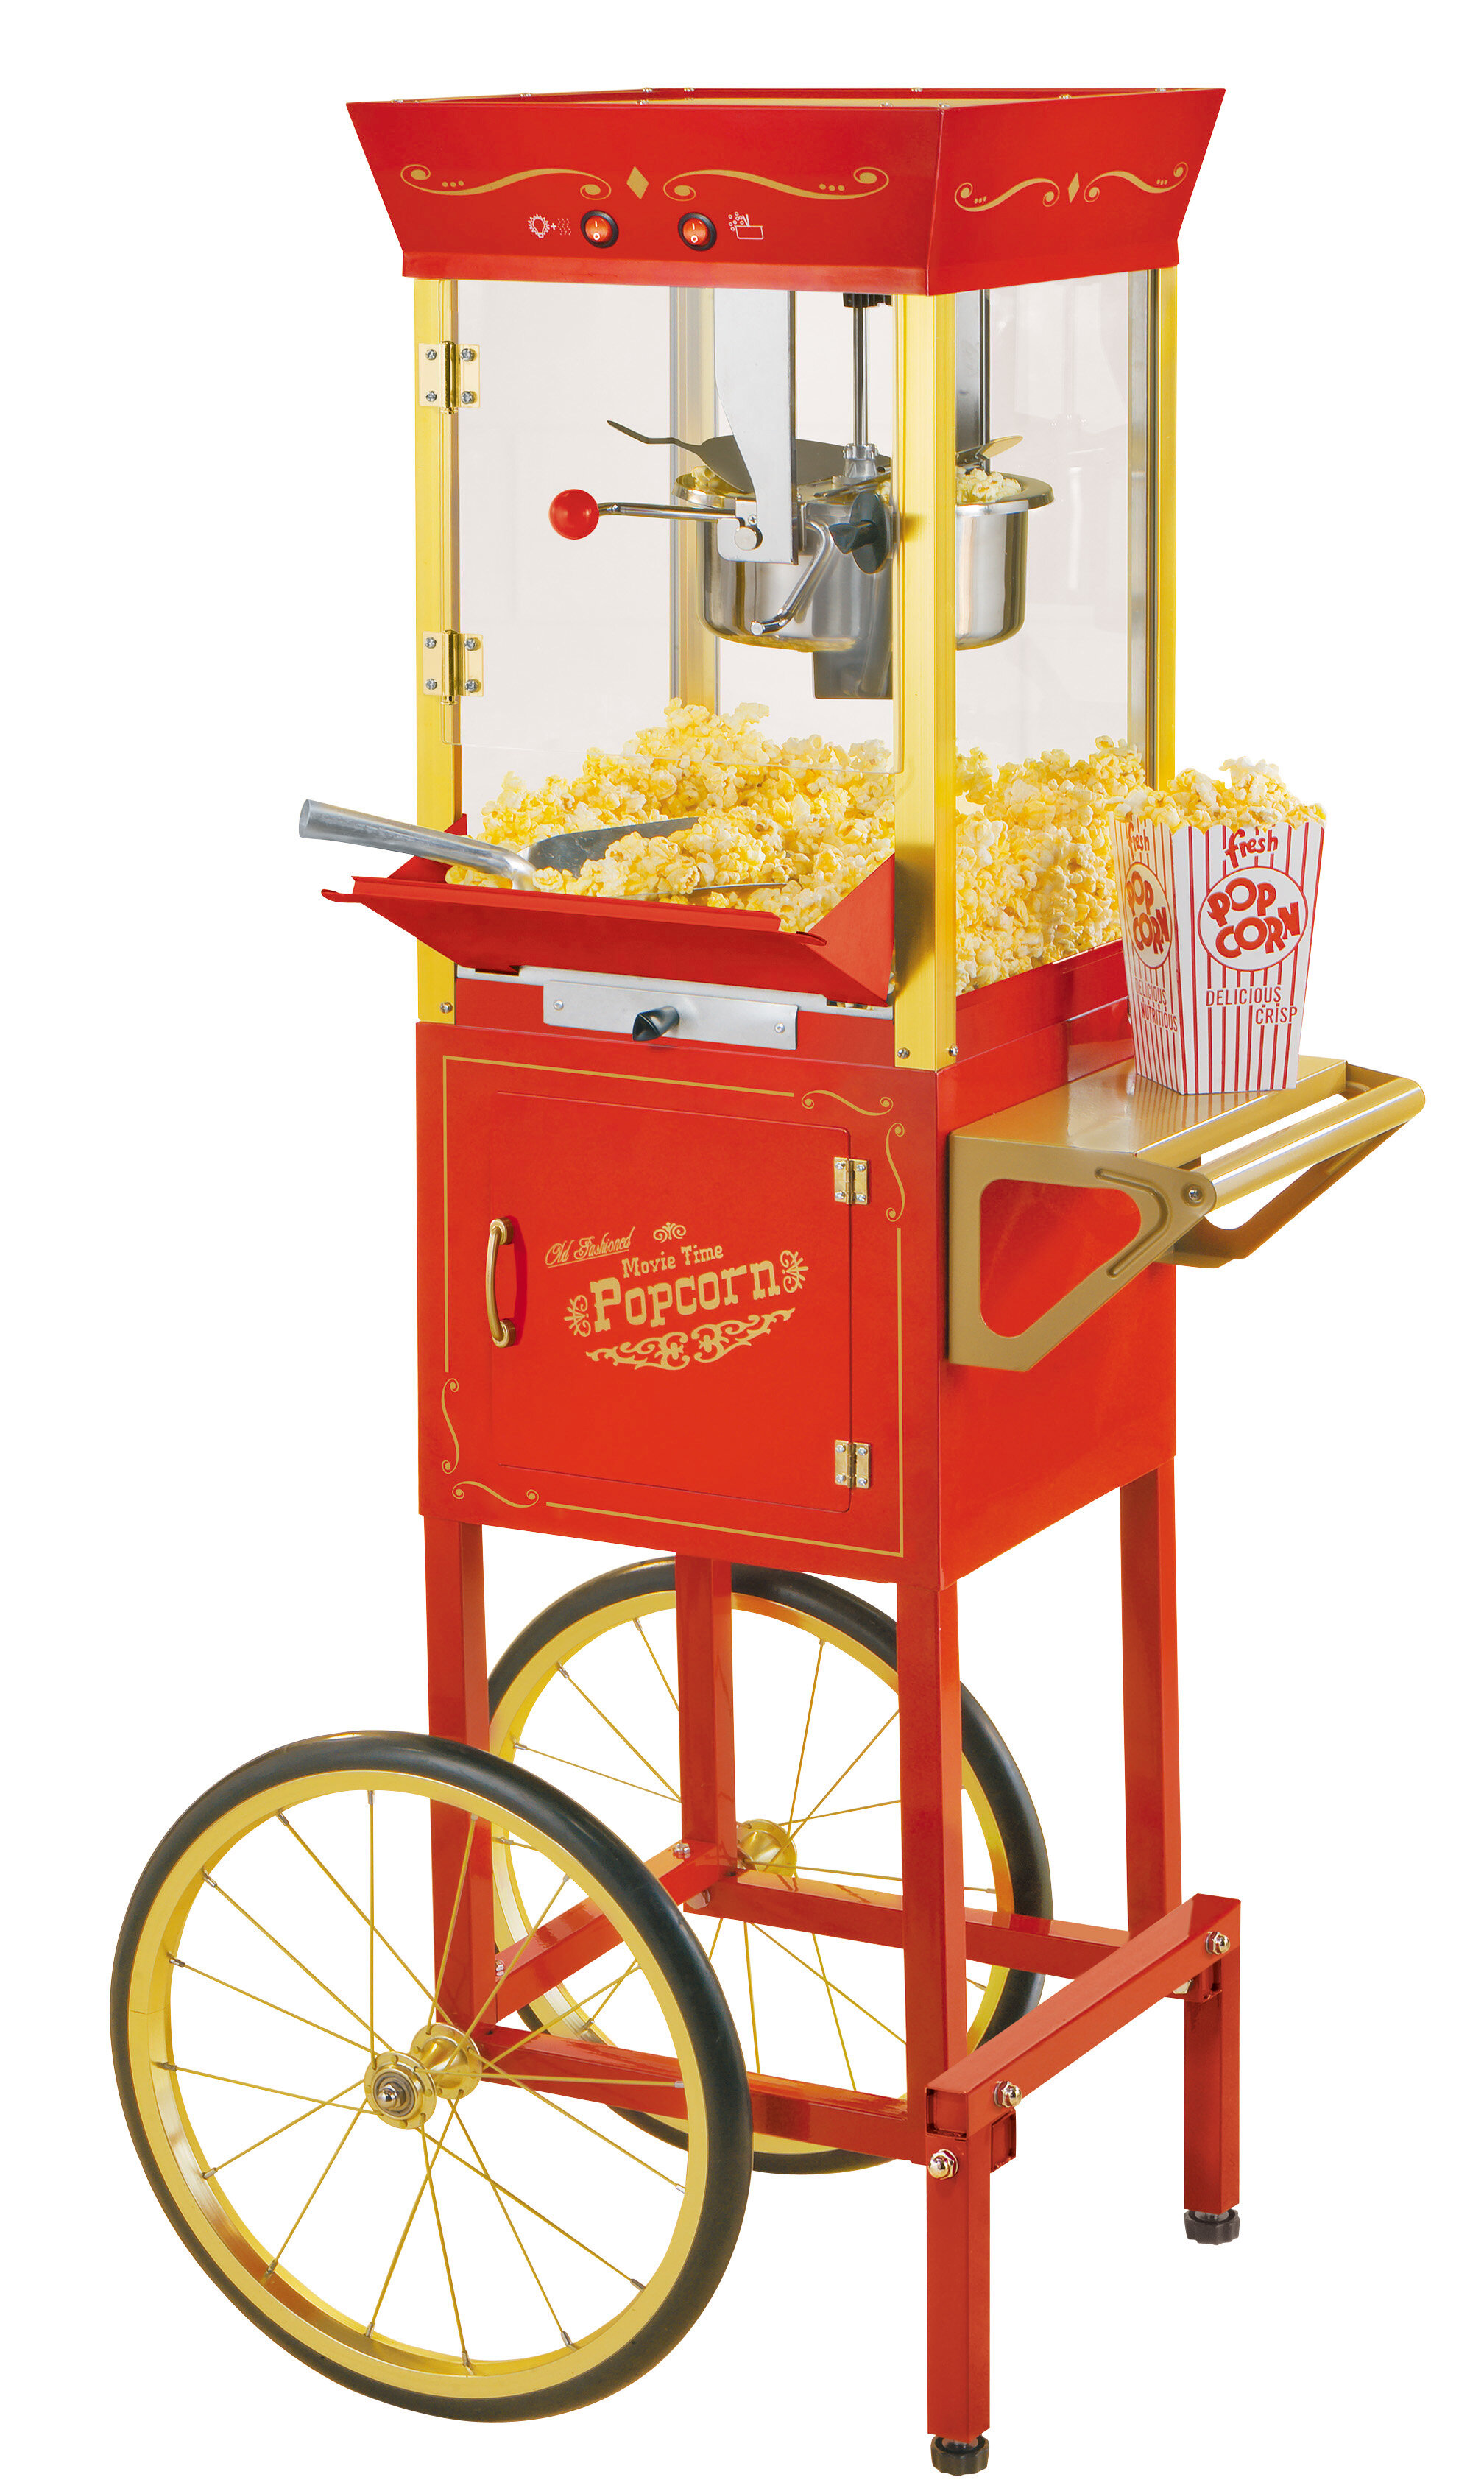 3c574b6e51 Nostalgia Electrics Nostalgia 6 oz. Vintage Circus Popcorn Cart Maker    Reviews